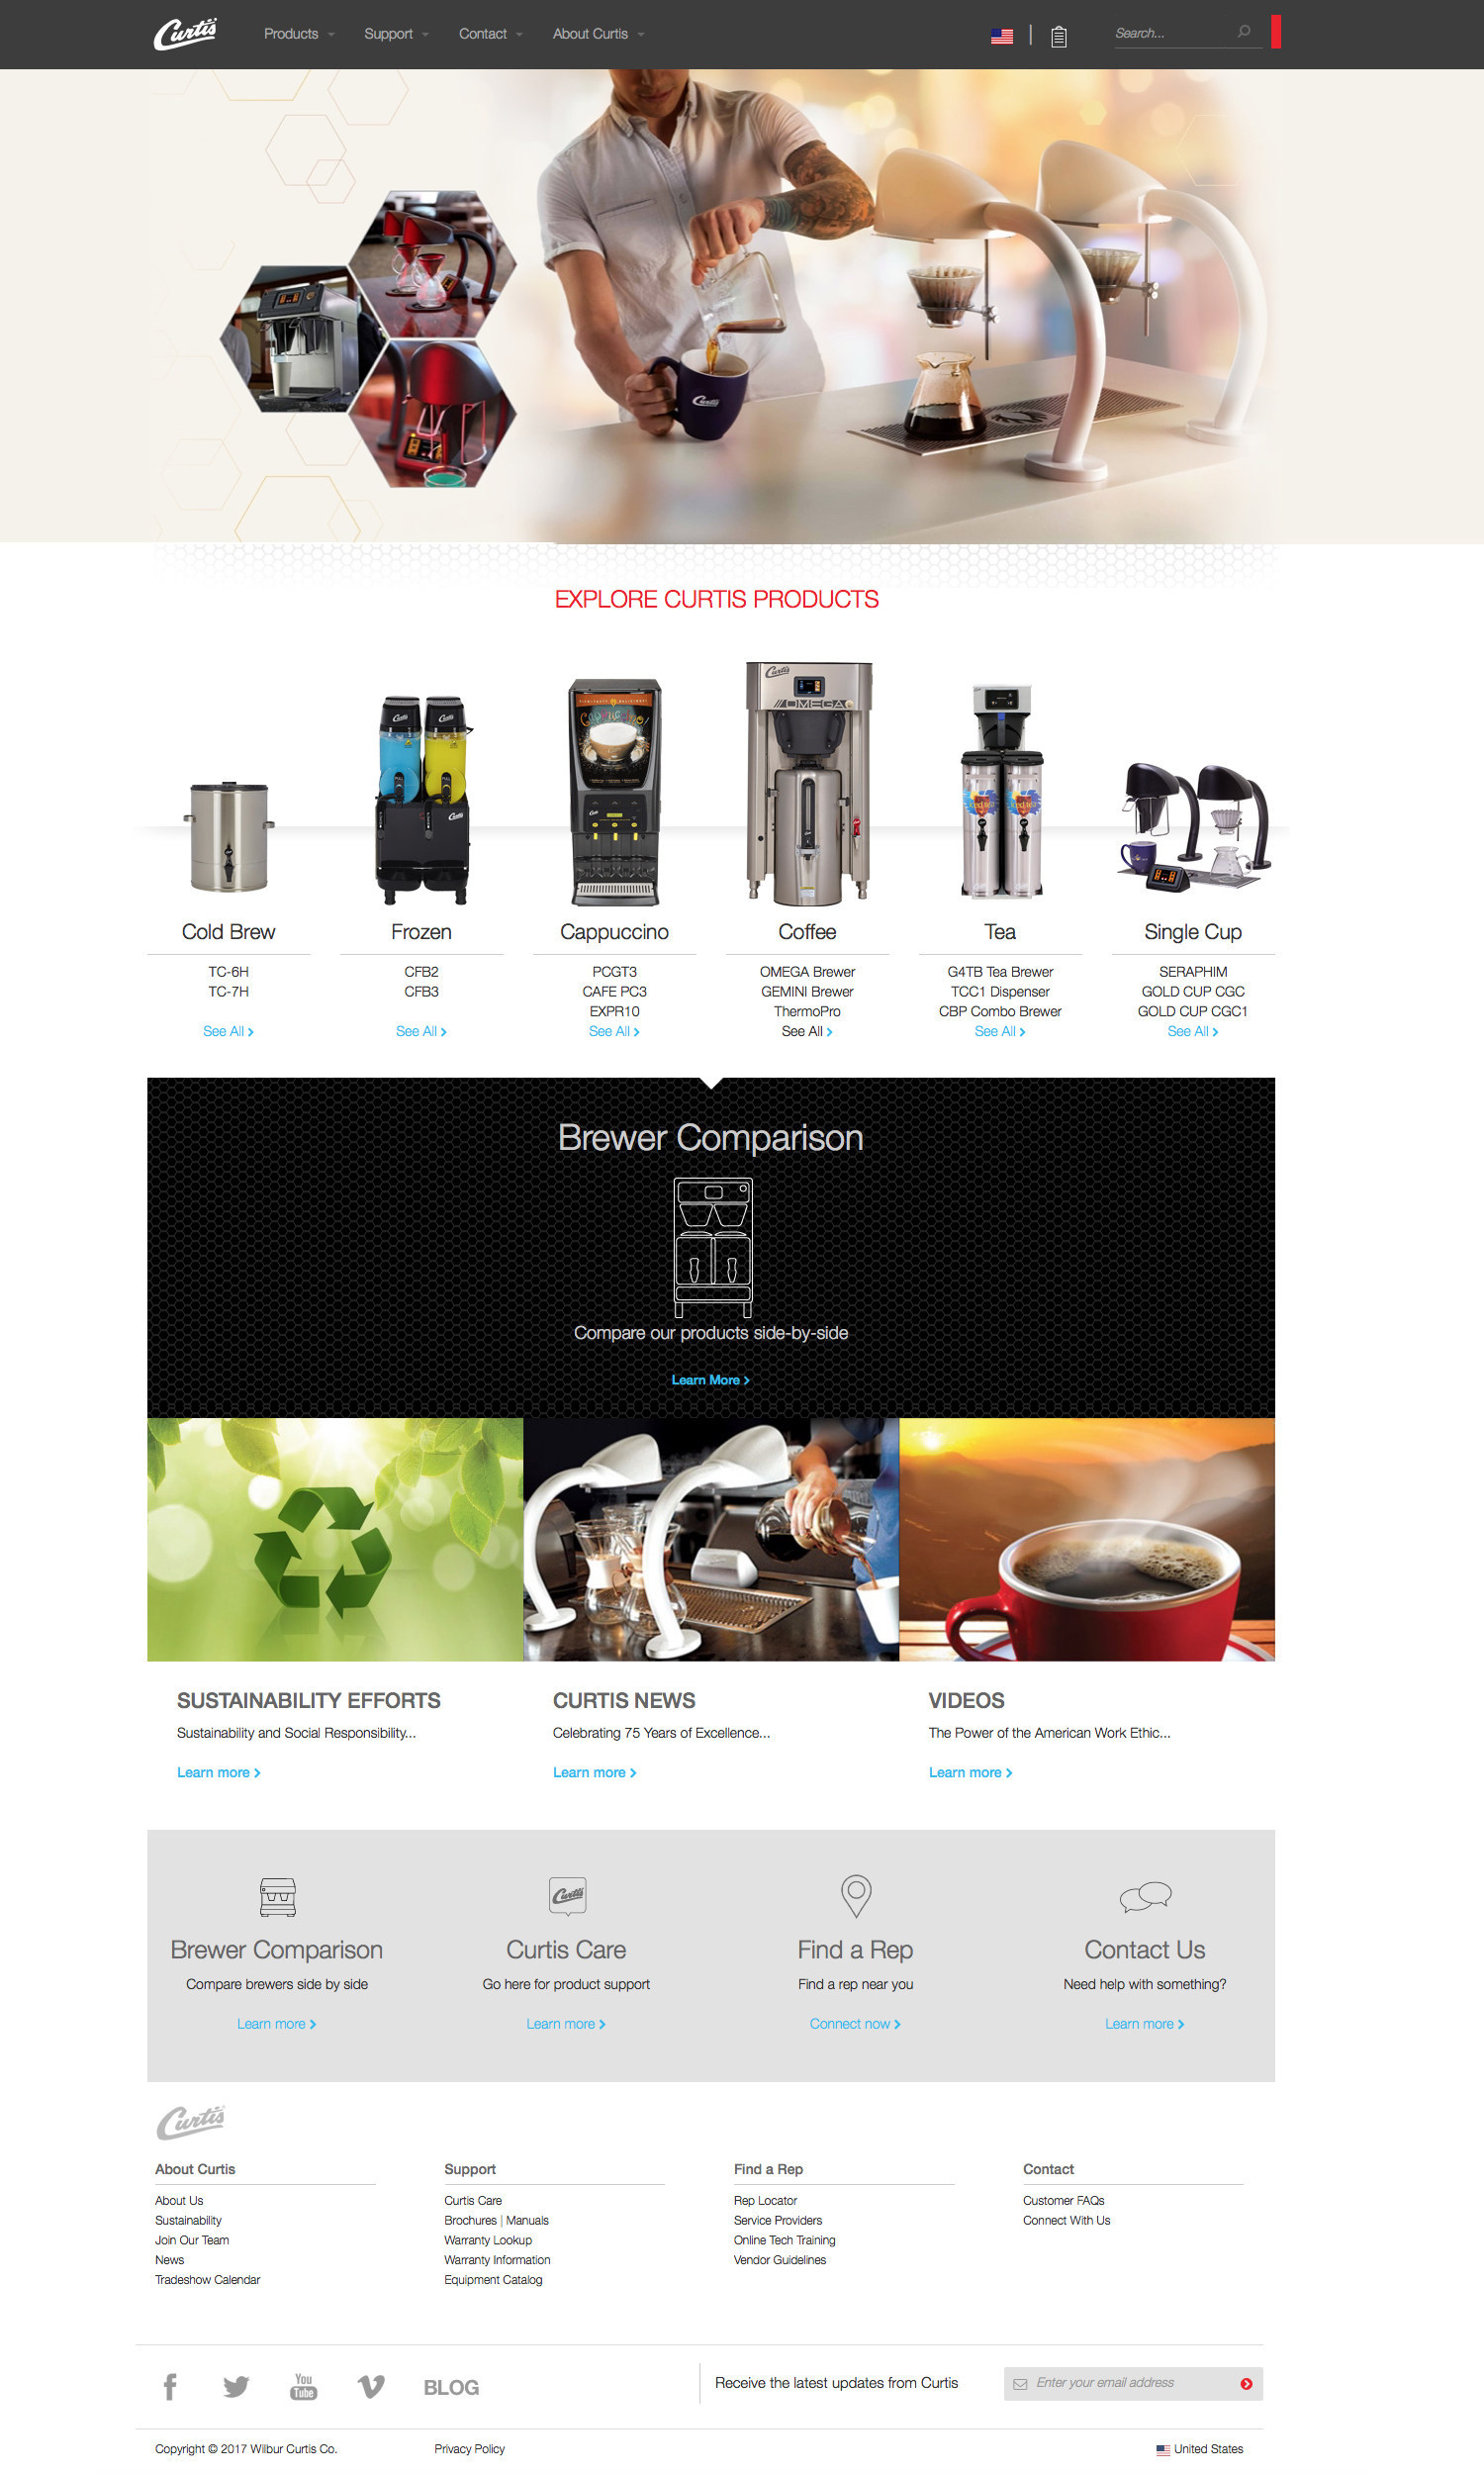 wilburcurtis.com homepage